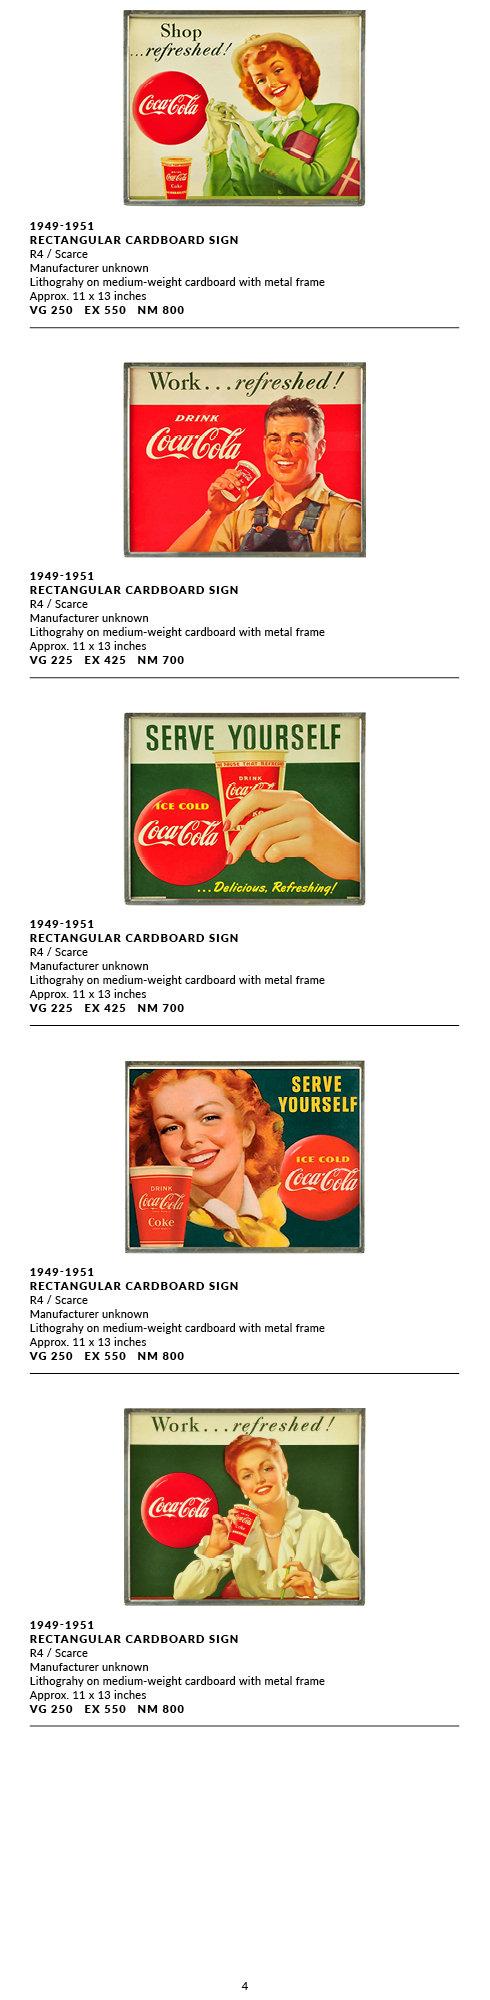 2018_1940-1969RectCardboards4.jpg